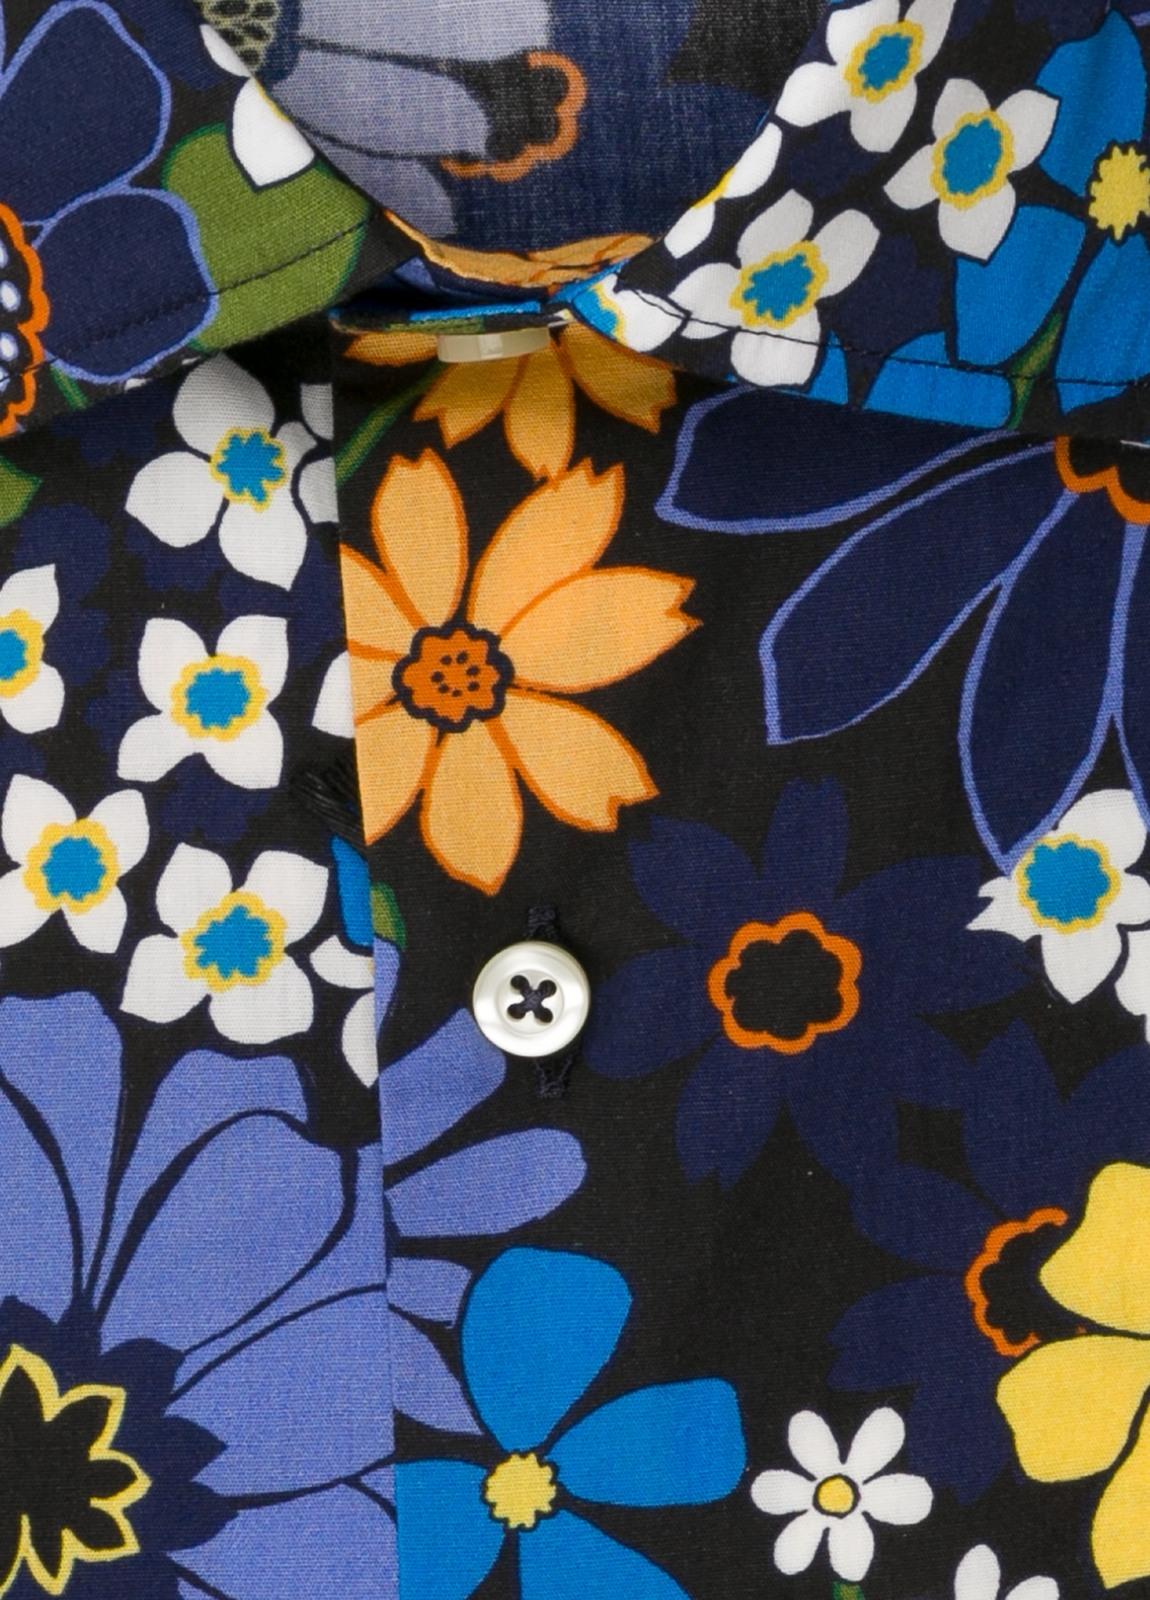 Camisa sport FUREST COLECCIÓN SLIM FIT flores azul - Ítem1